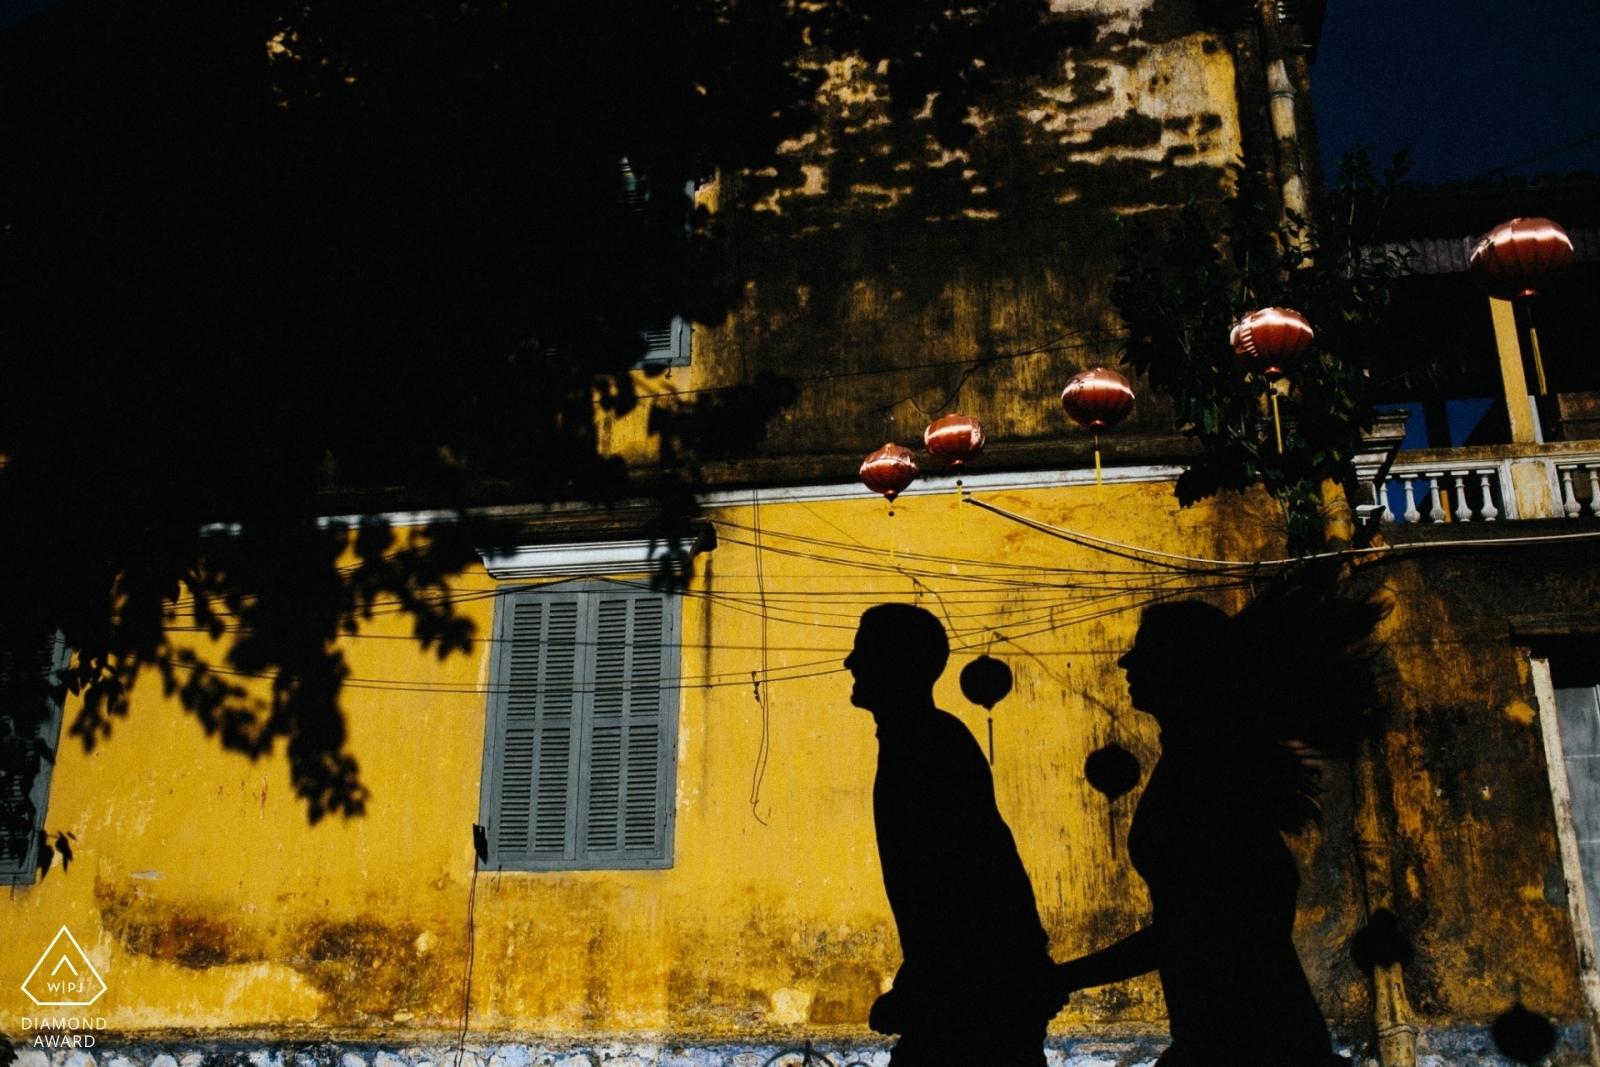 Danang-Hoi An-Wedding-Photography-4.jpg